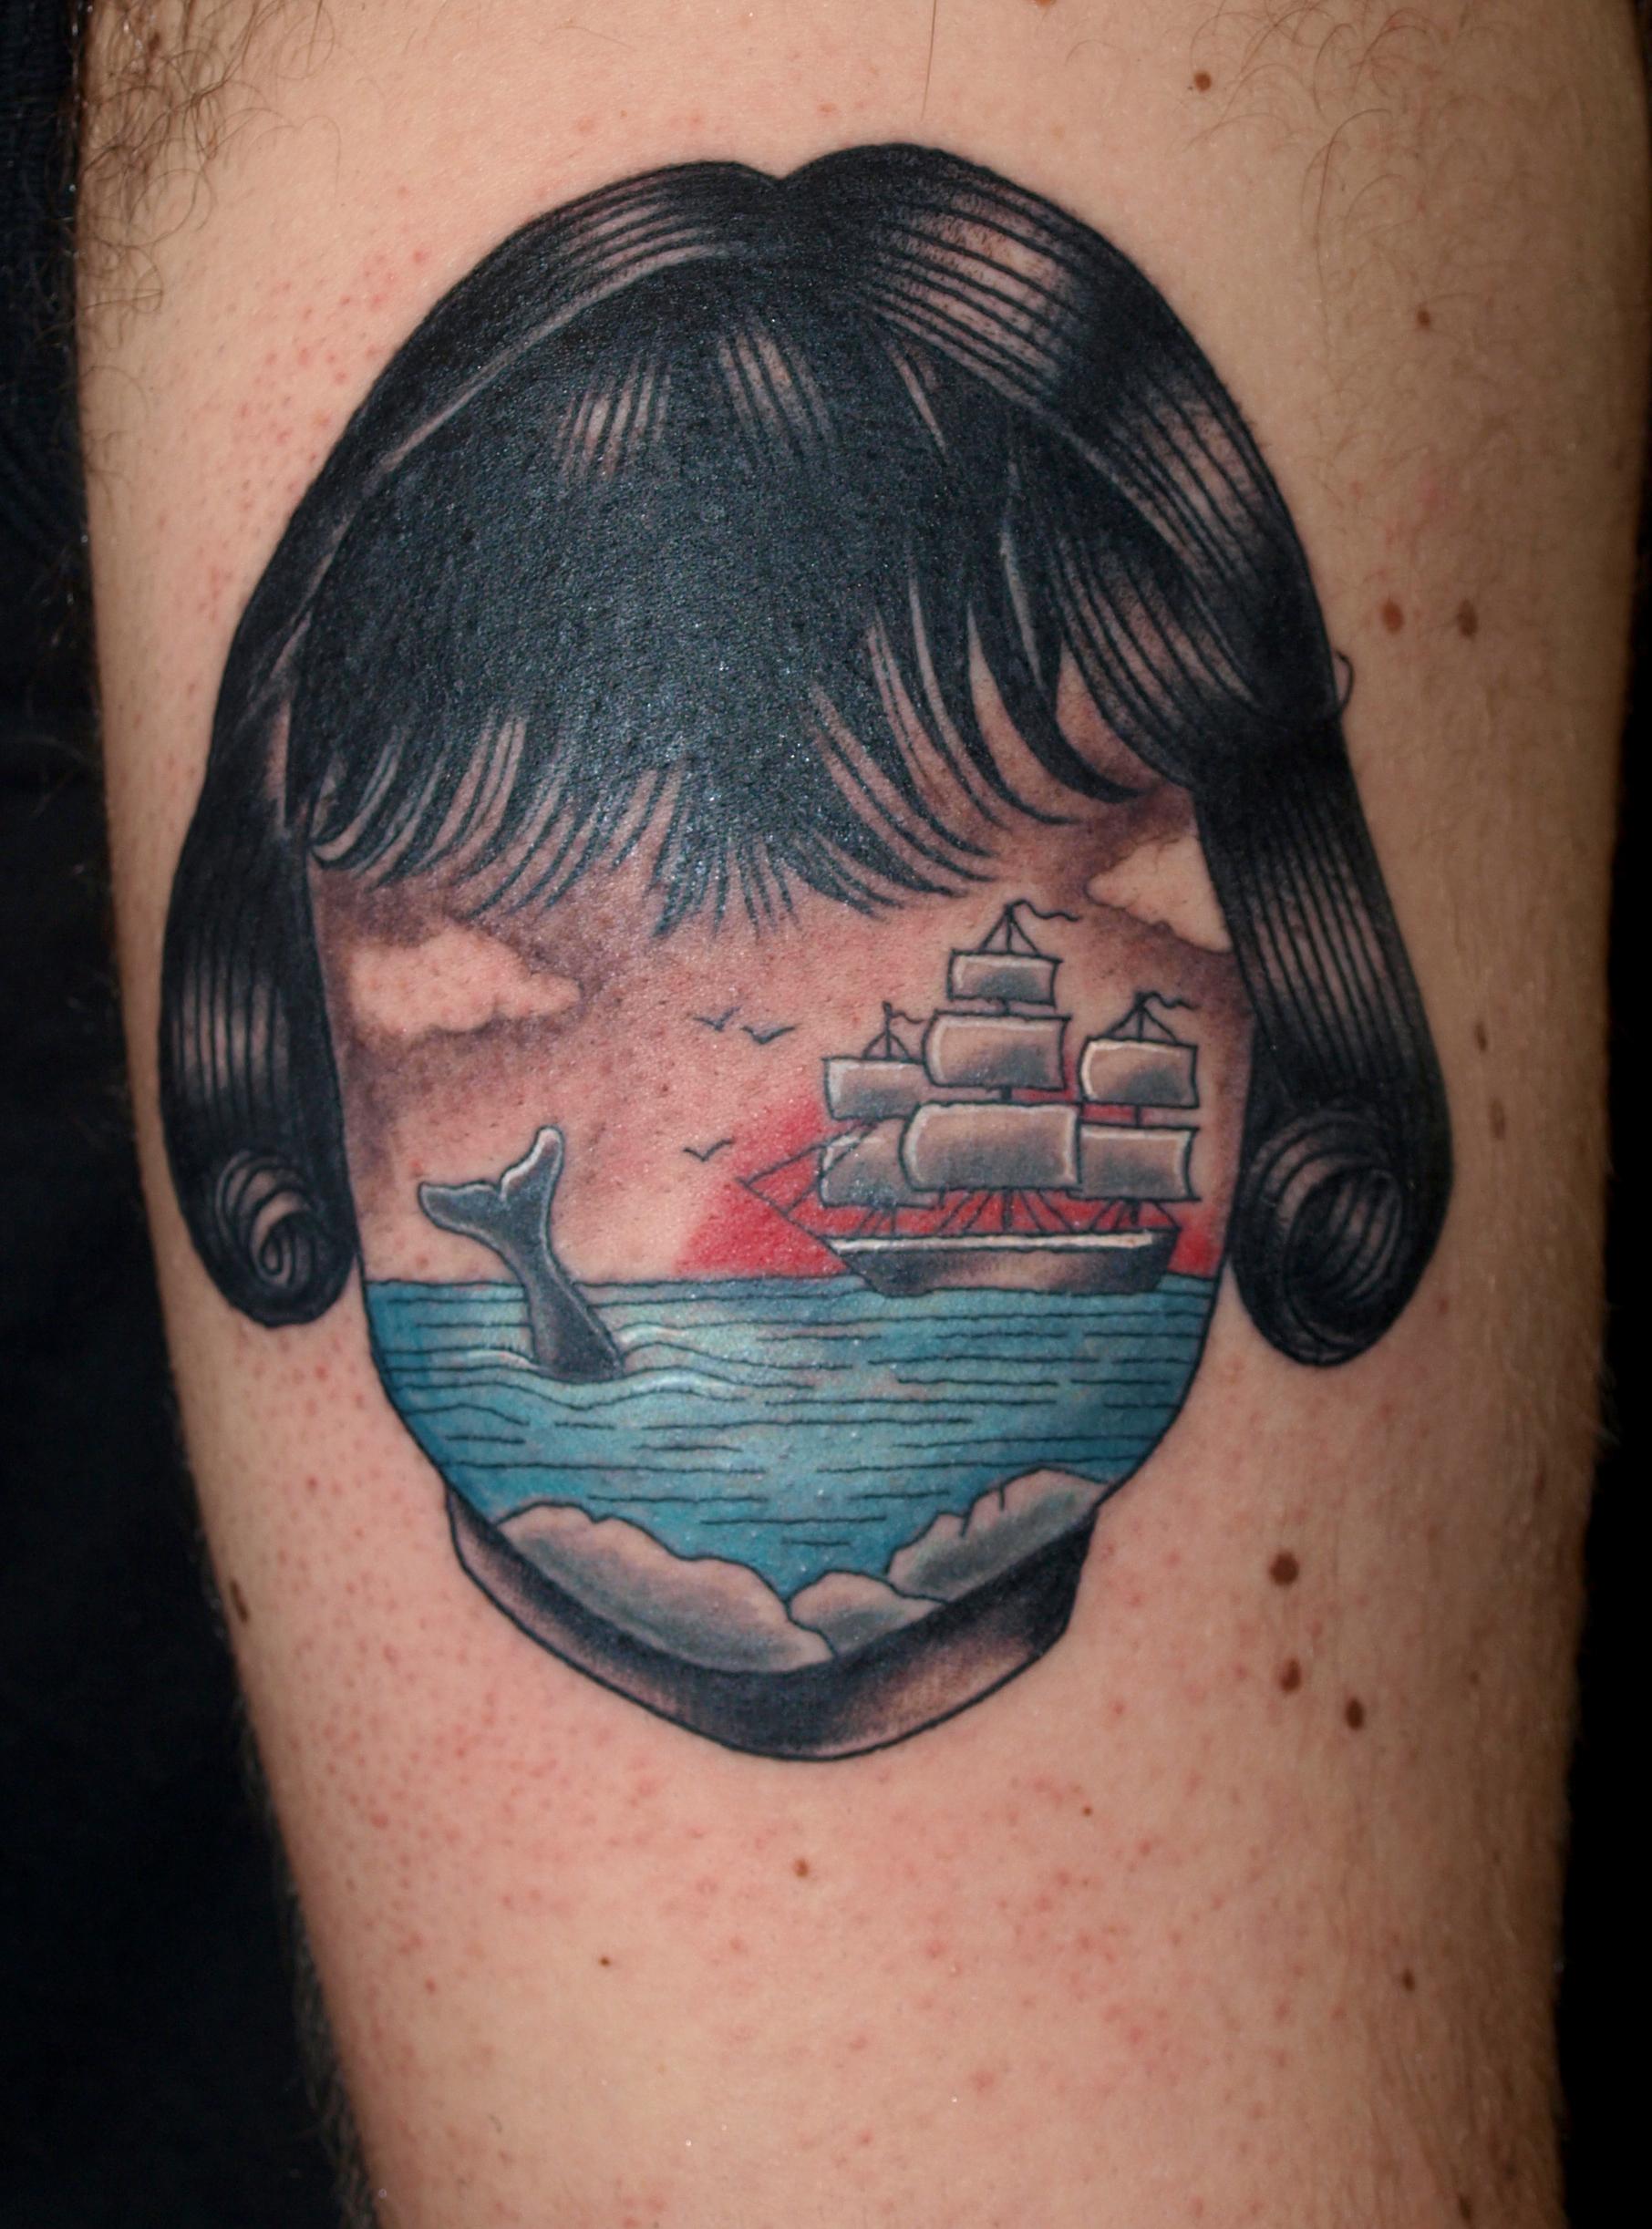 Pietro Sedda Tattoo